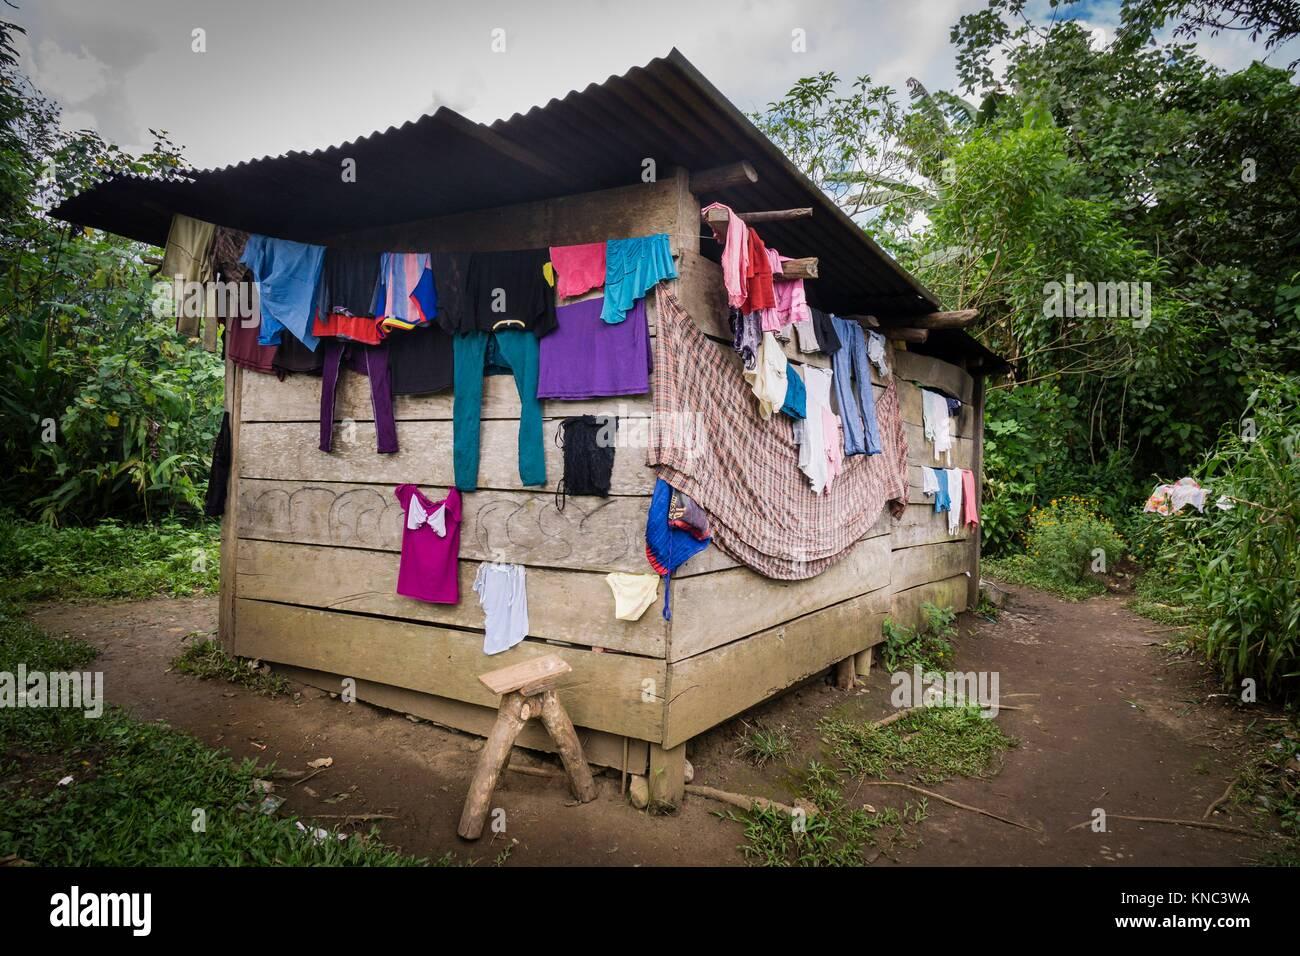 cabaña tipica con la colada secandose, Lancetillo, La Parroquia, zona Reyna, Quiche, Guatemala, Central America. - Stock Image